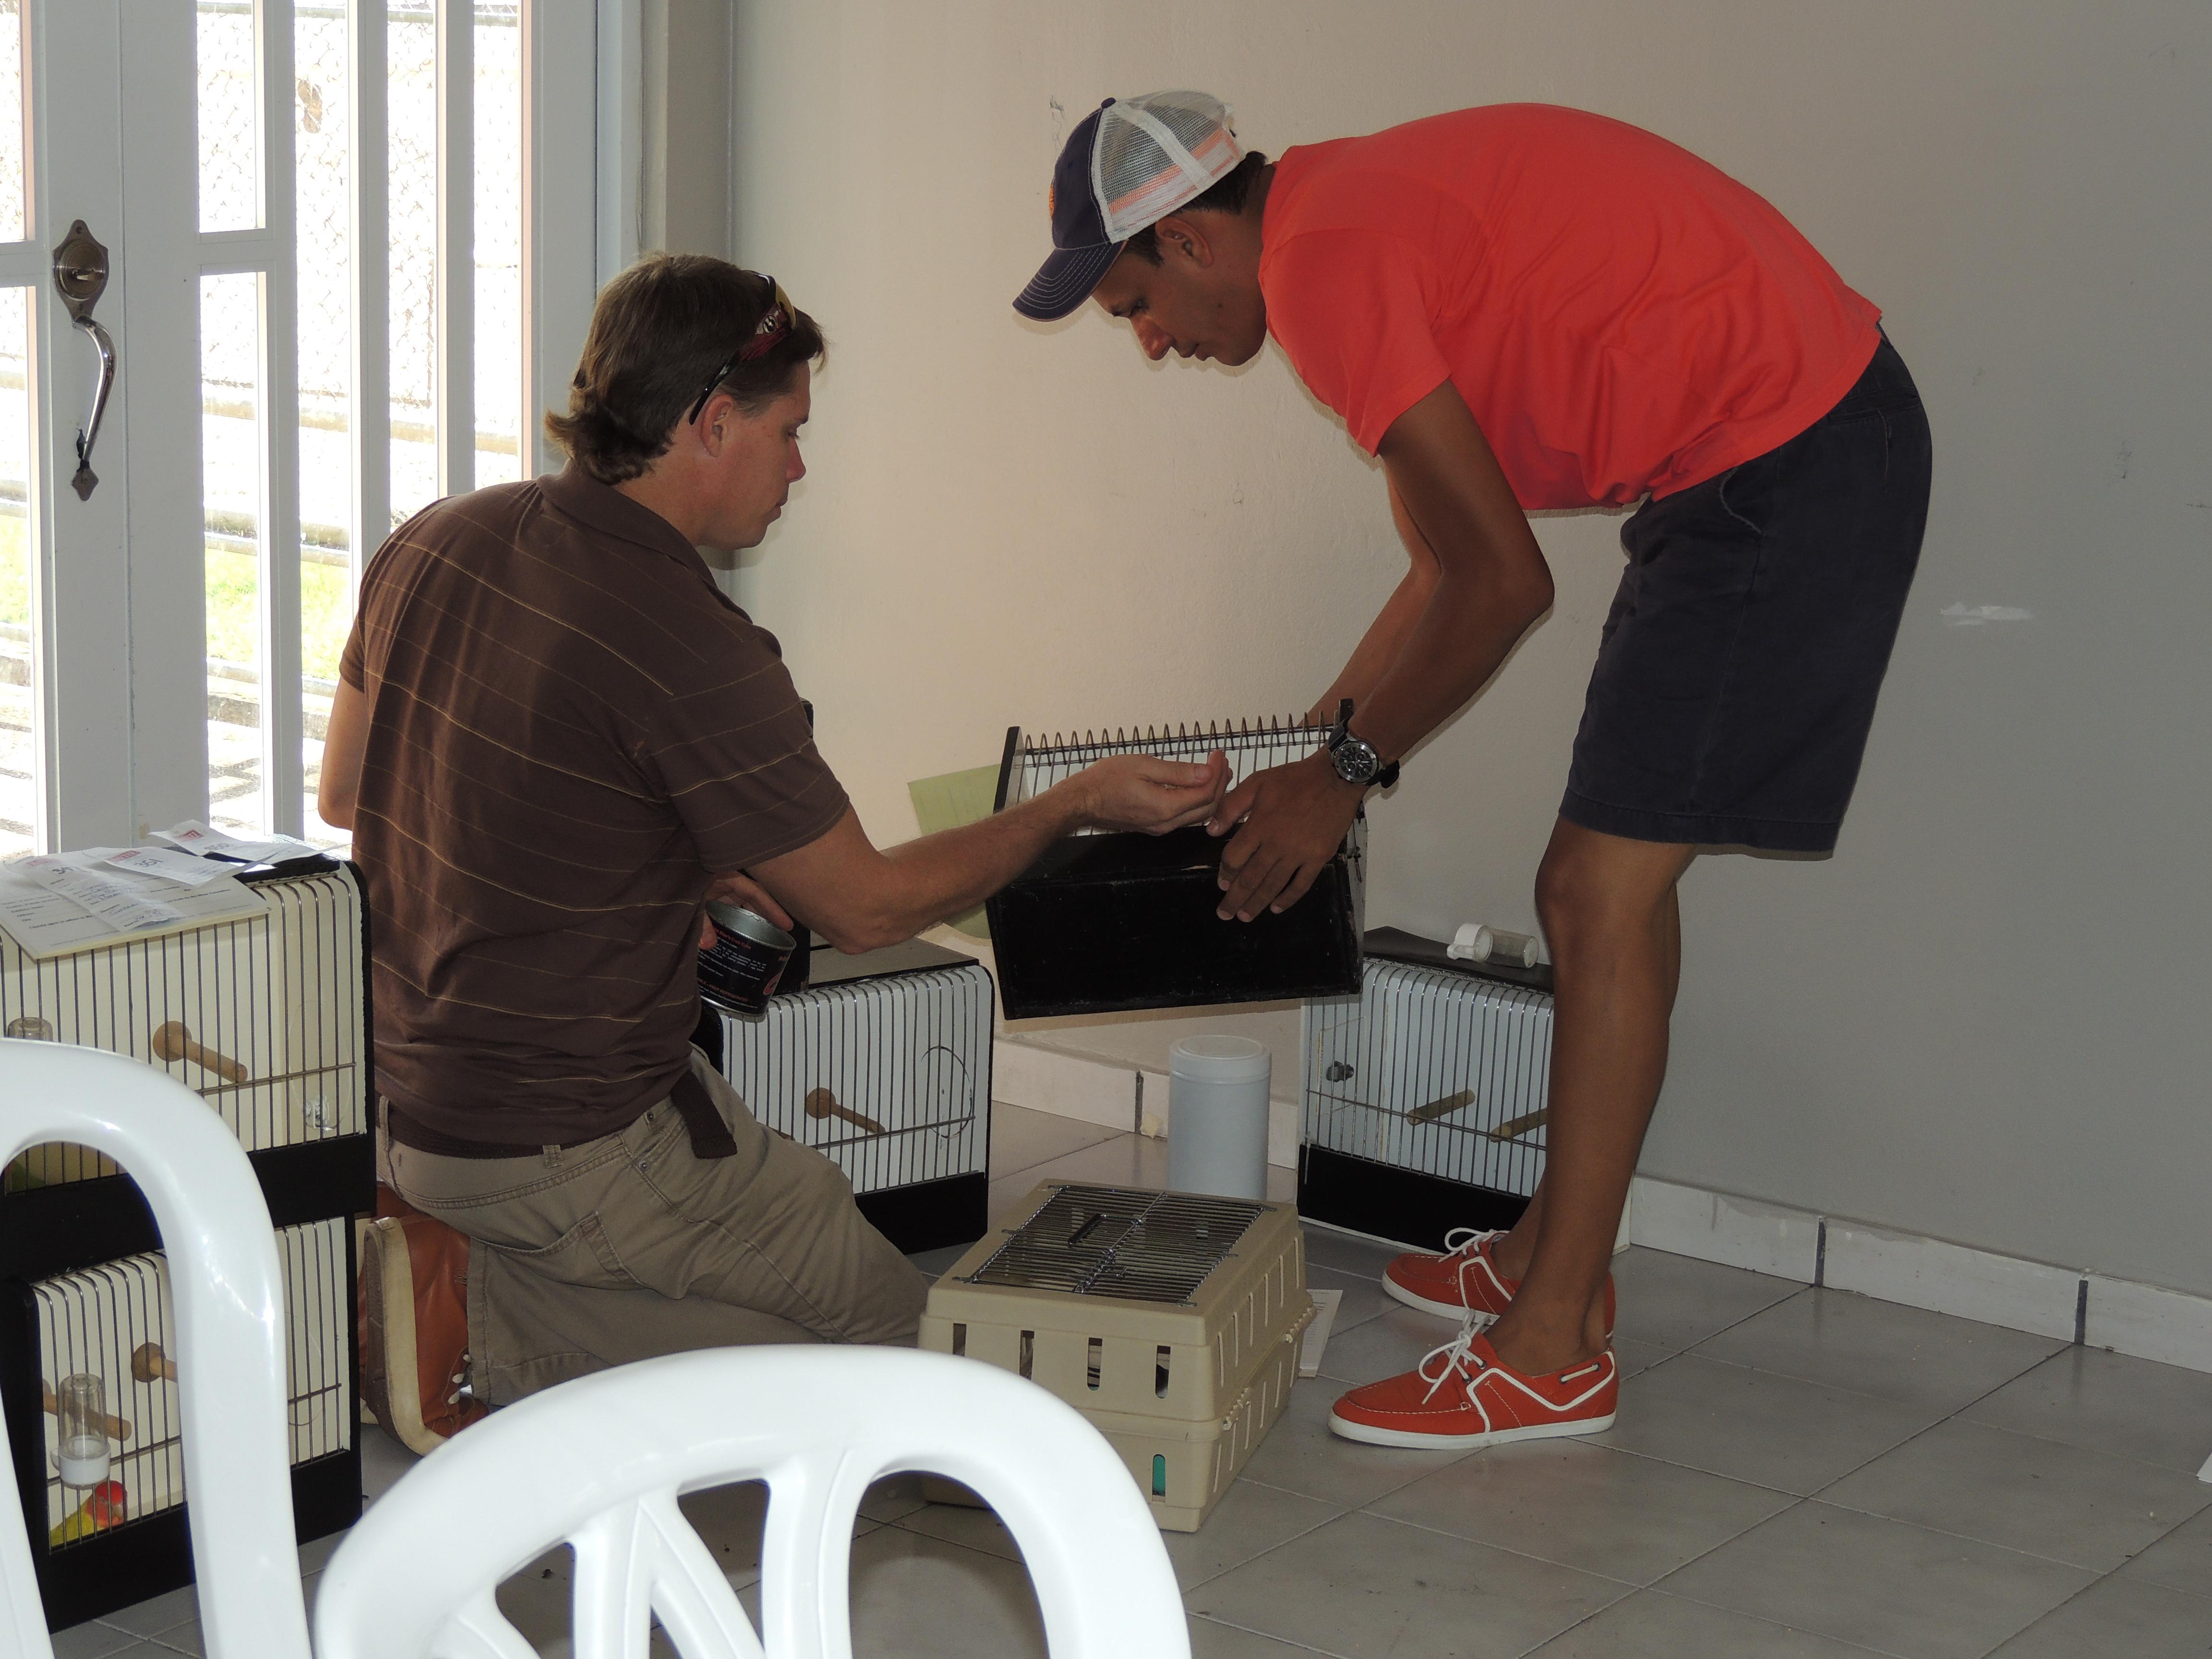 Getting the birds ready. Preparando a las aves. Courtesy Marilena Salmones